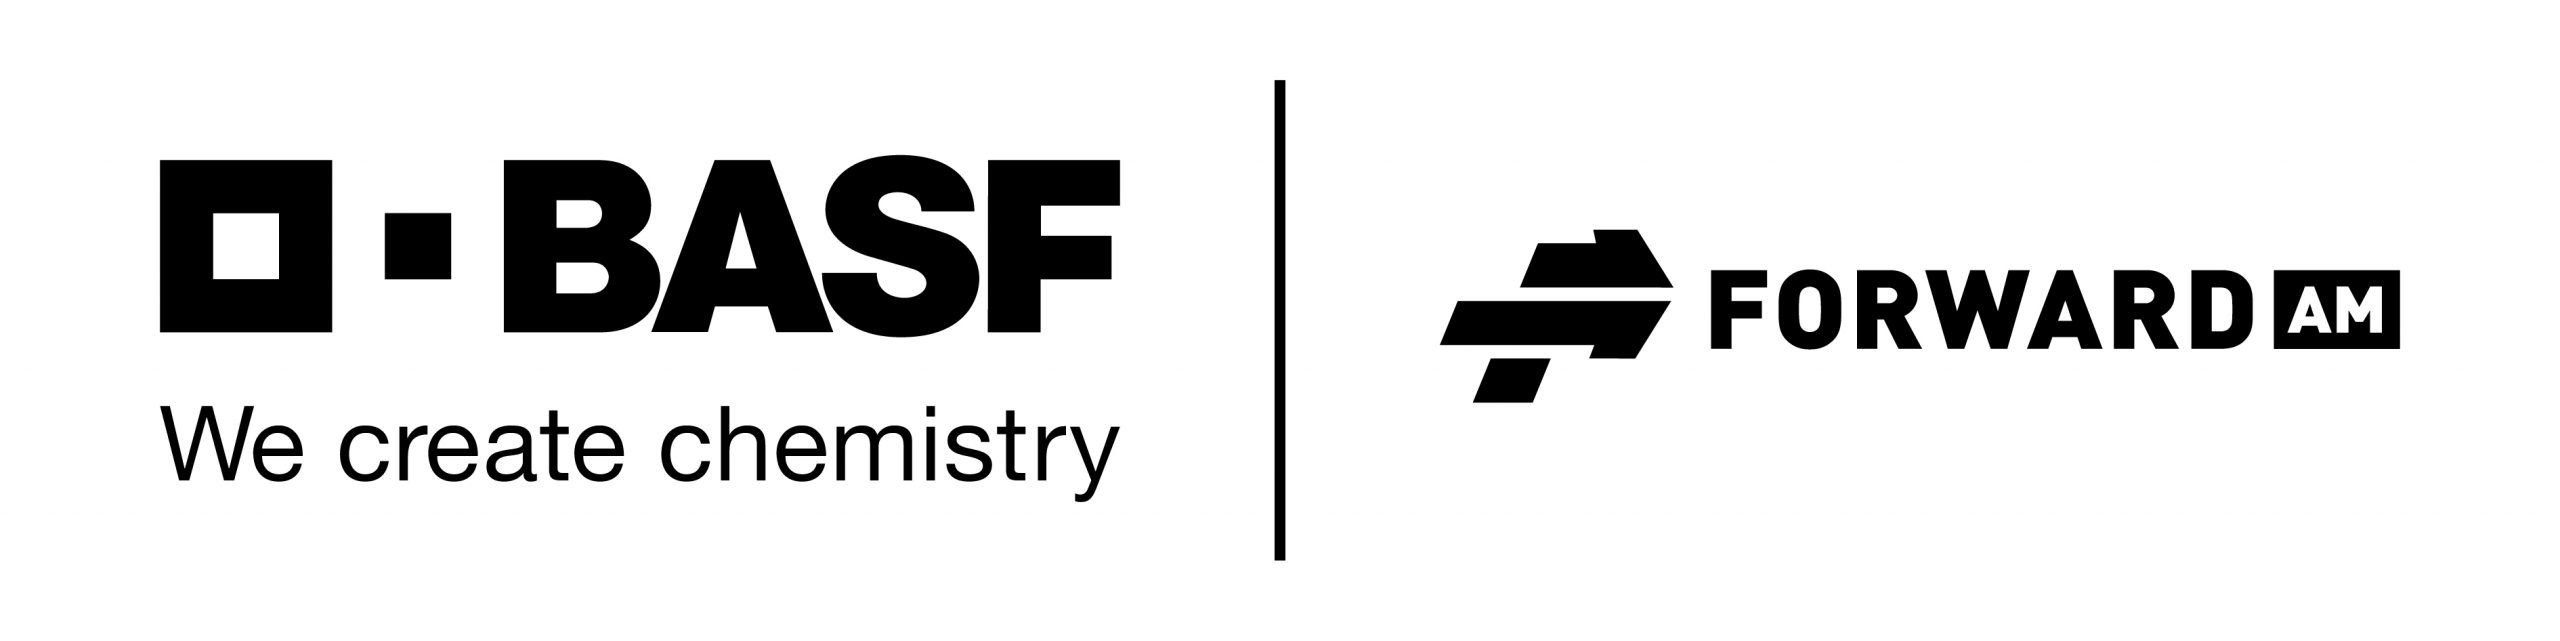 ForwardAM_Logo_CMYK_BASF-Left_Black